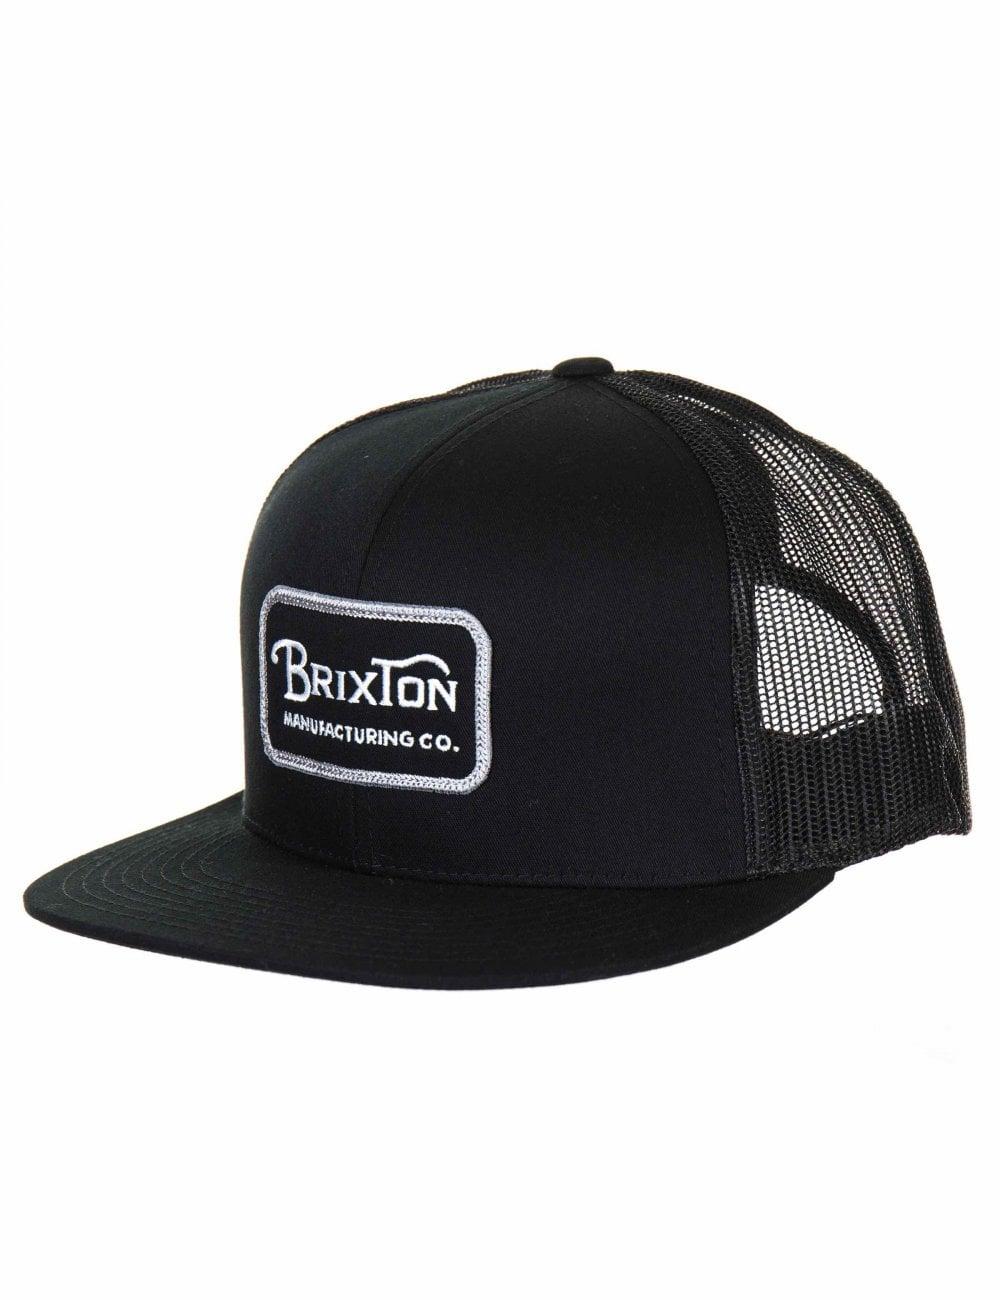 6d79c9ca858 Brixton Grade Mesh Trucker Hat - Black/Grey - Accessories from Fat ...